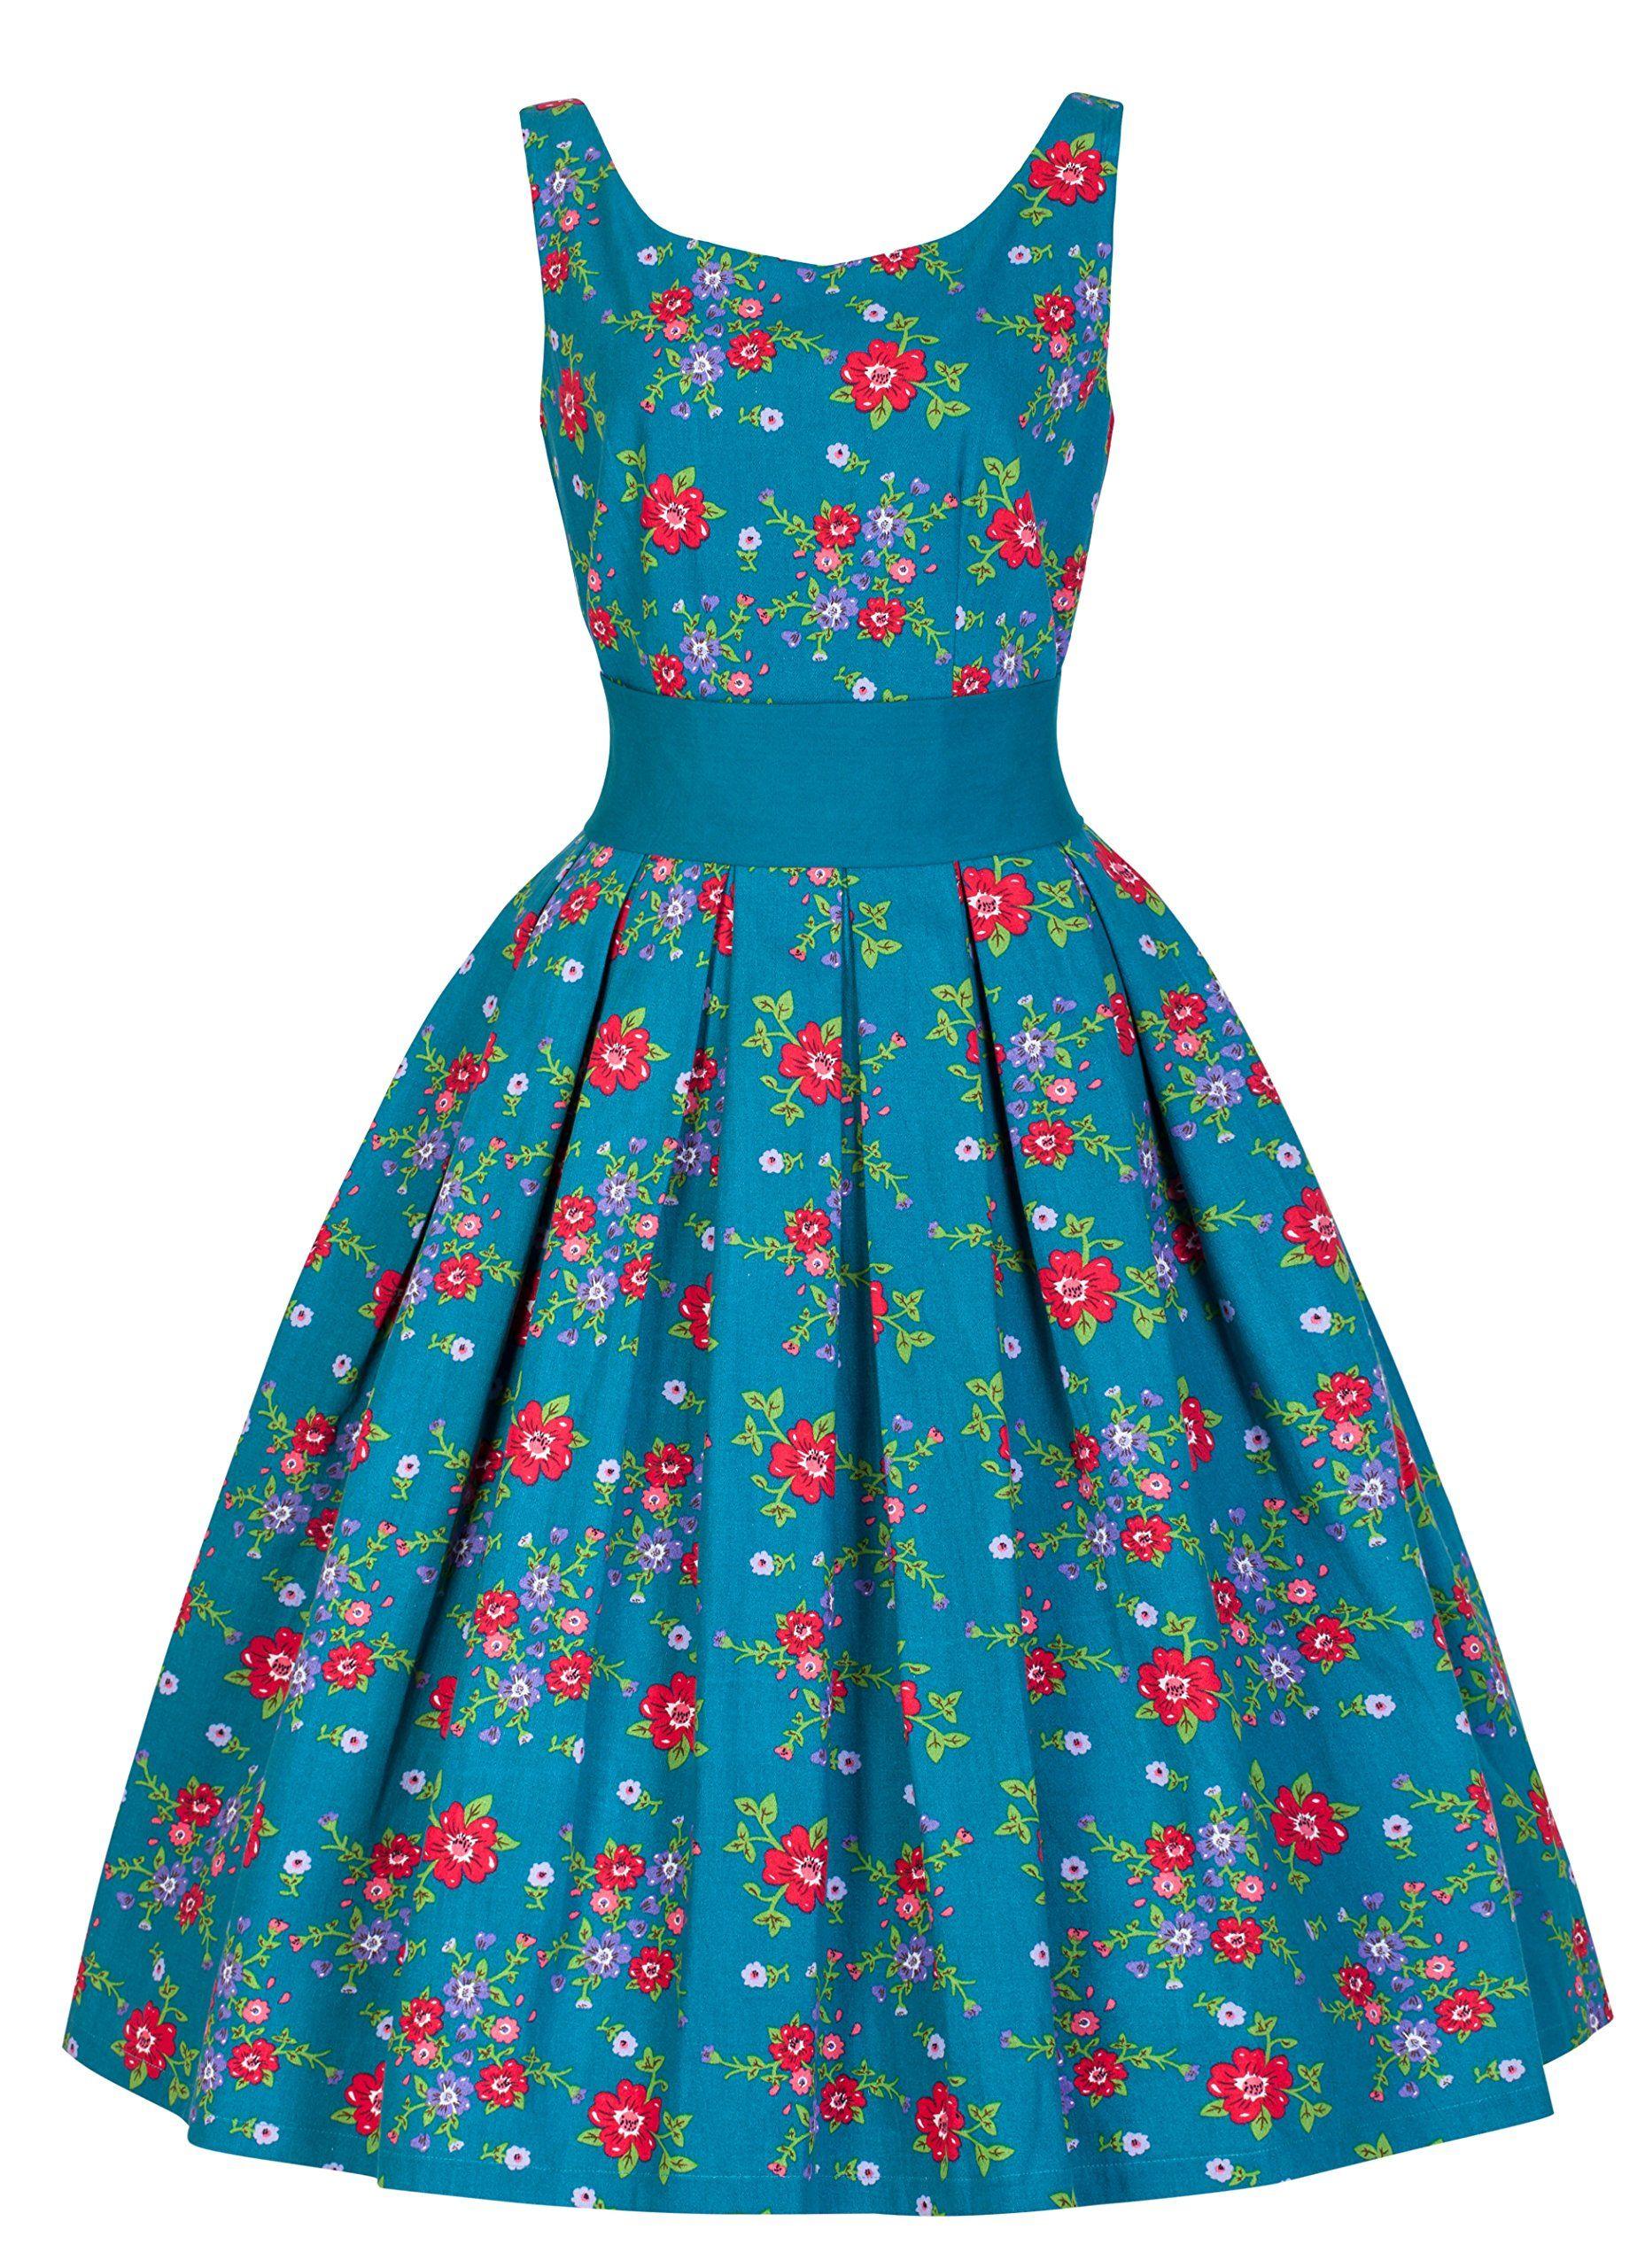 Lindy Bop \'Lana\' Elegant Vintage 1950\'s Garden Party Prom Dress (2XL ...